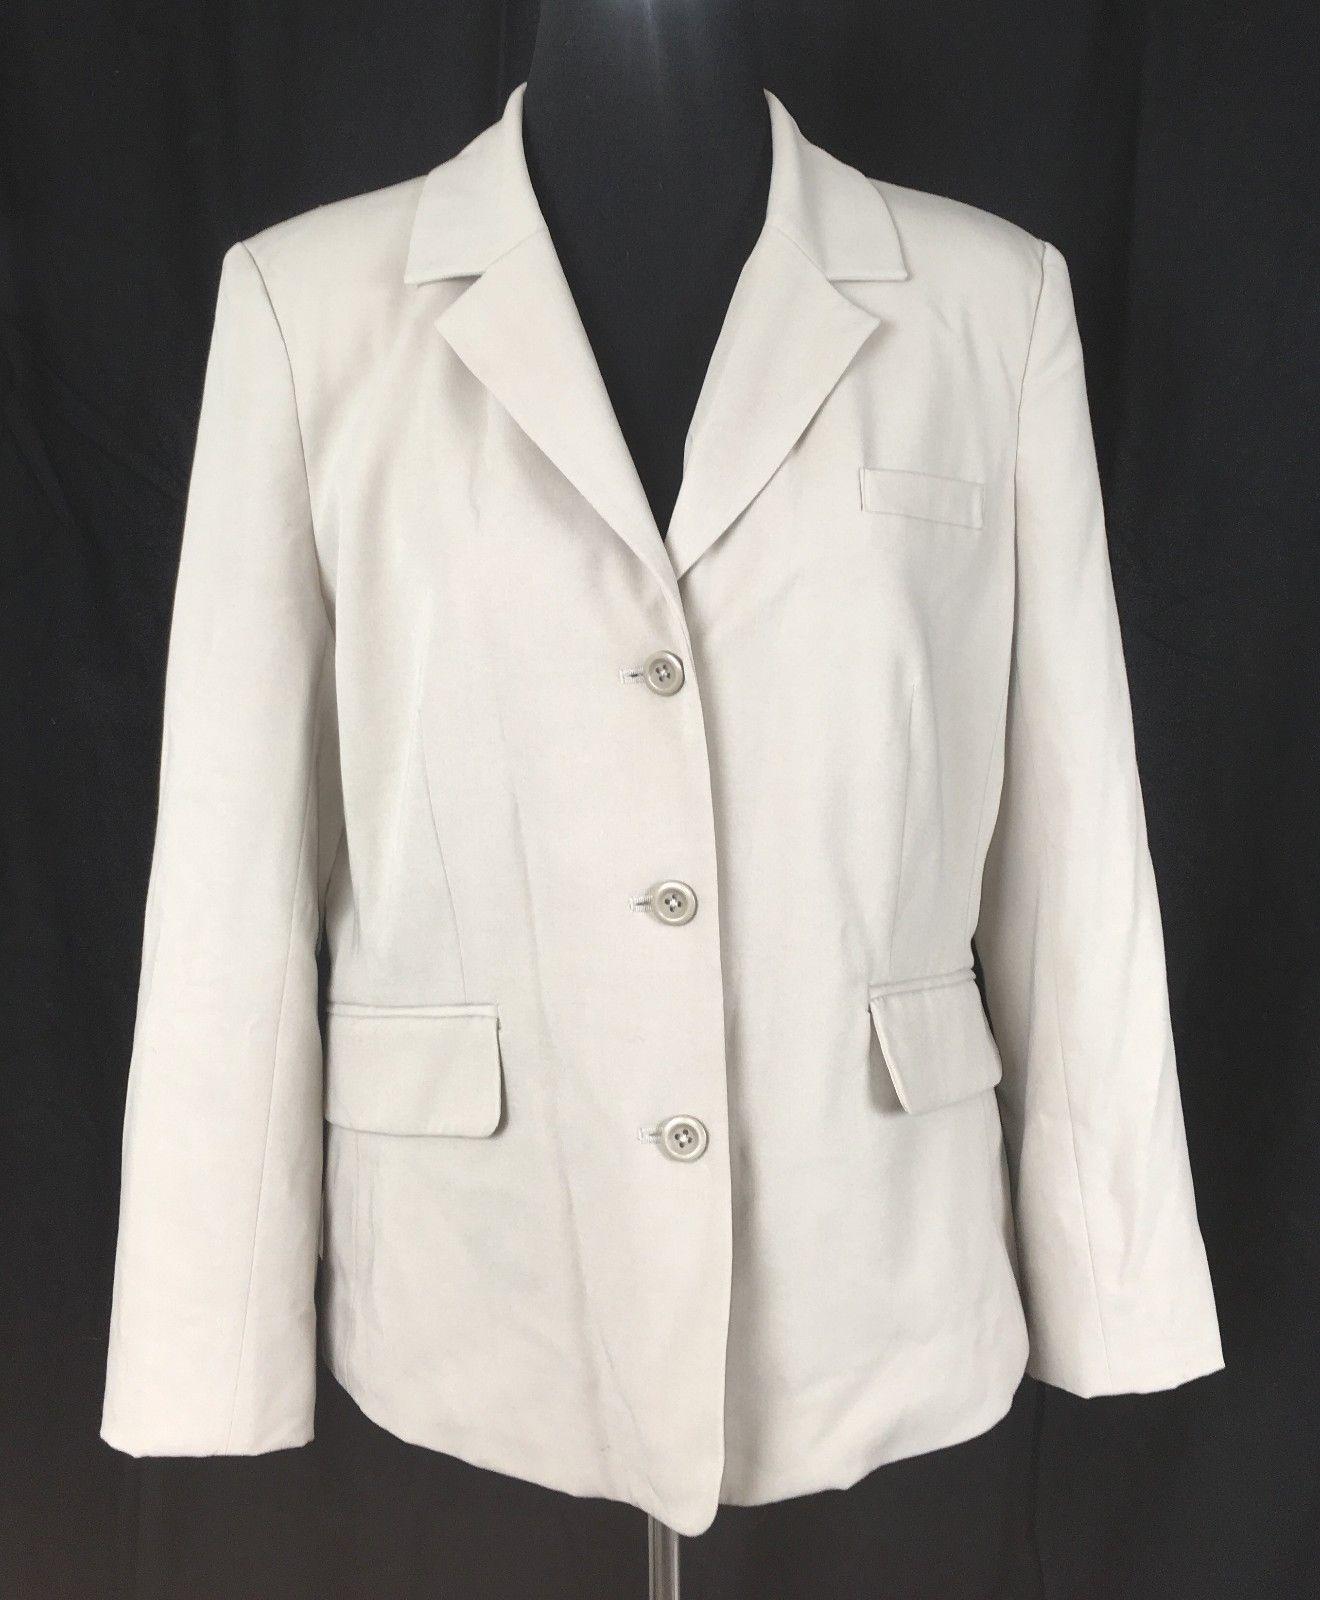 5f7aa148b Merona Beige/Ivory 3-Button Blazer Jacket and 50 similar items